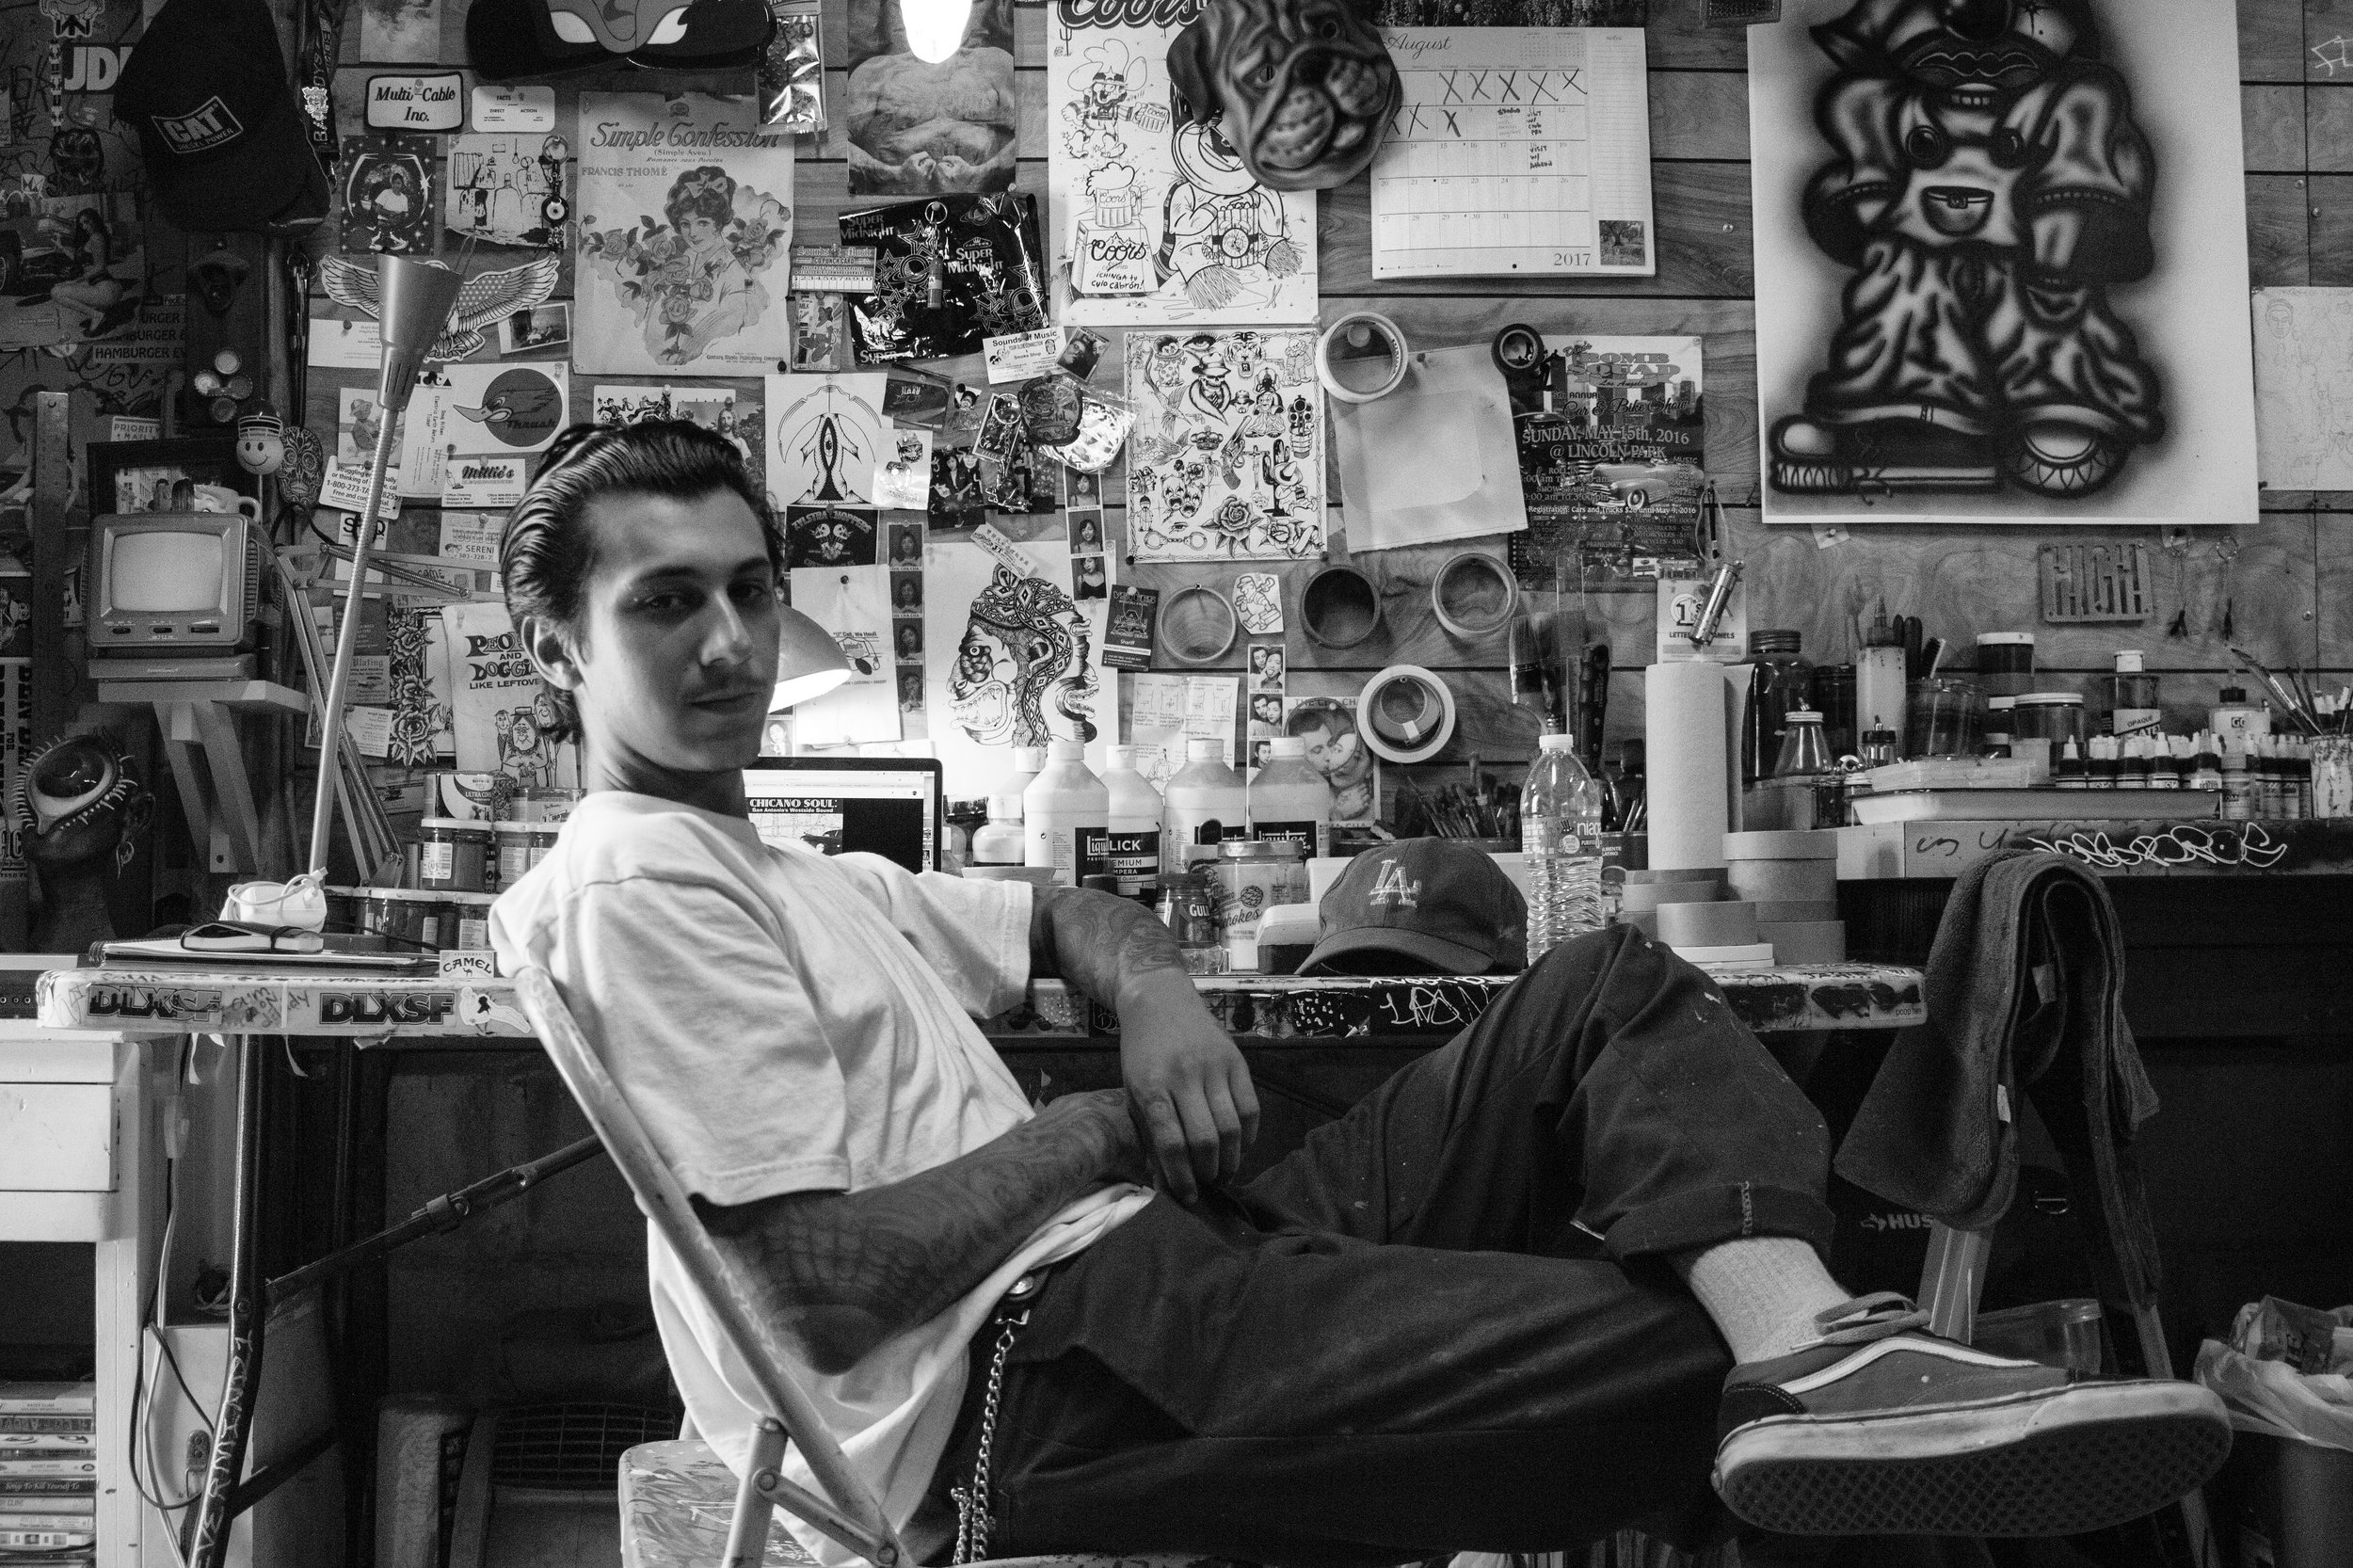 ARTIST MARIO AYALA IN HIS CHINATOWN STUDIO.